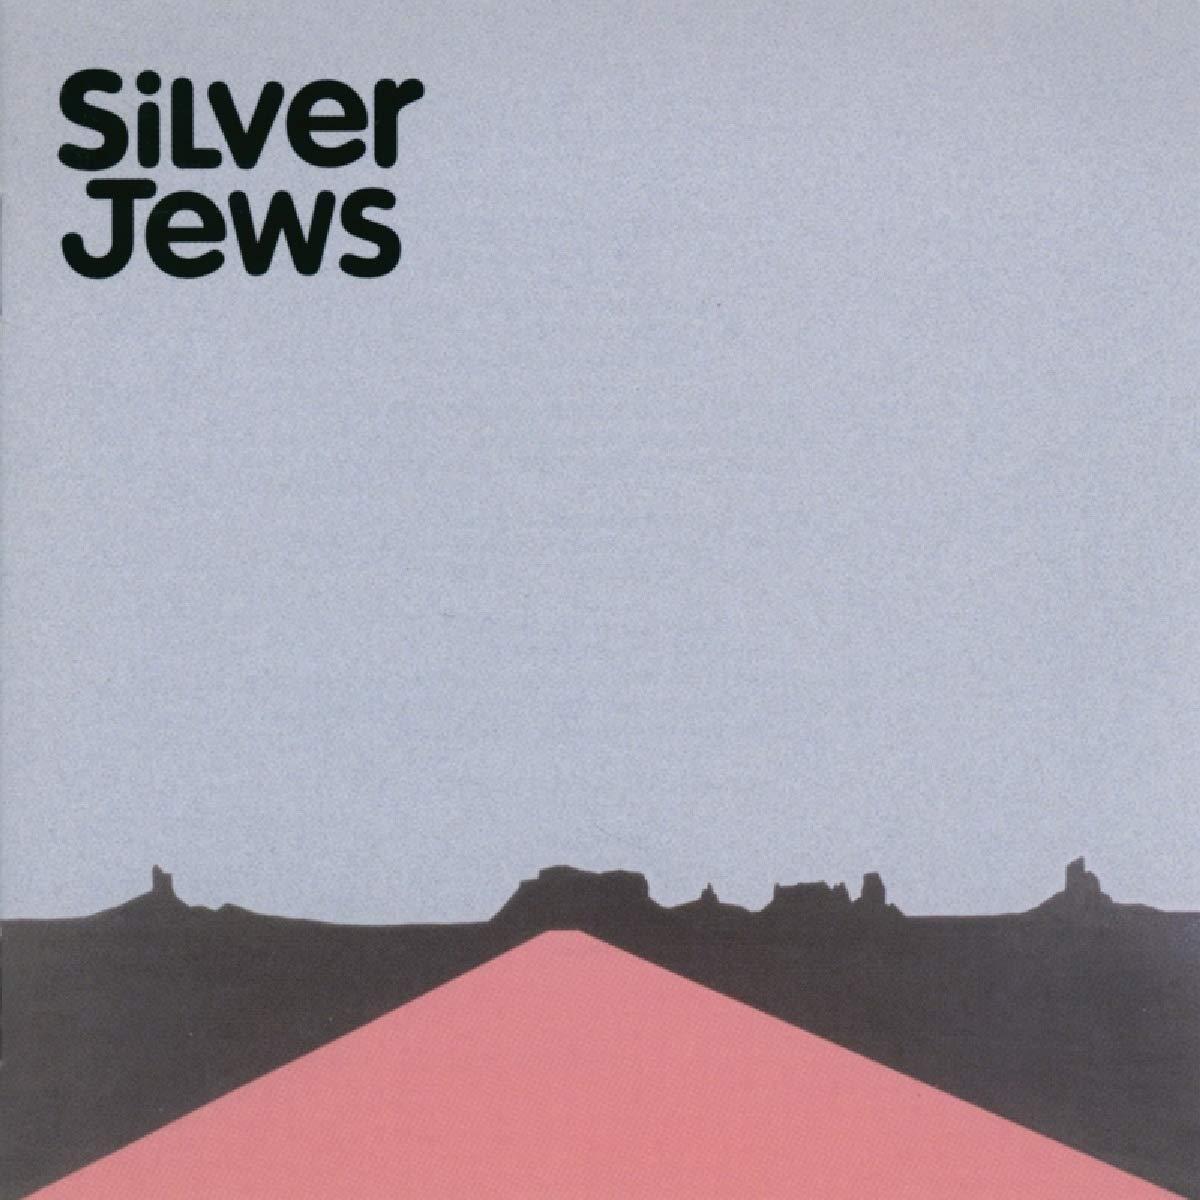 Cassette : Silver Jews - American Water (Cassette)